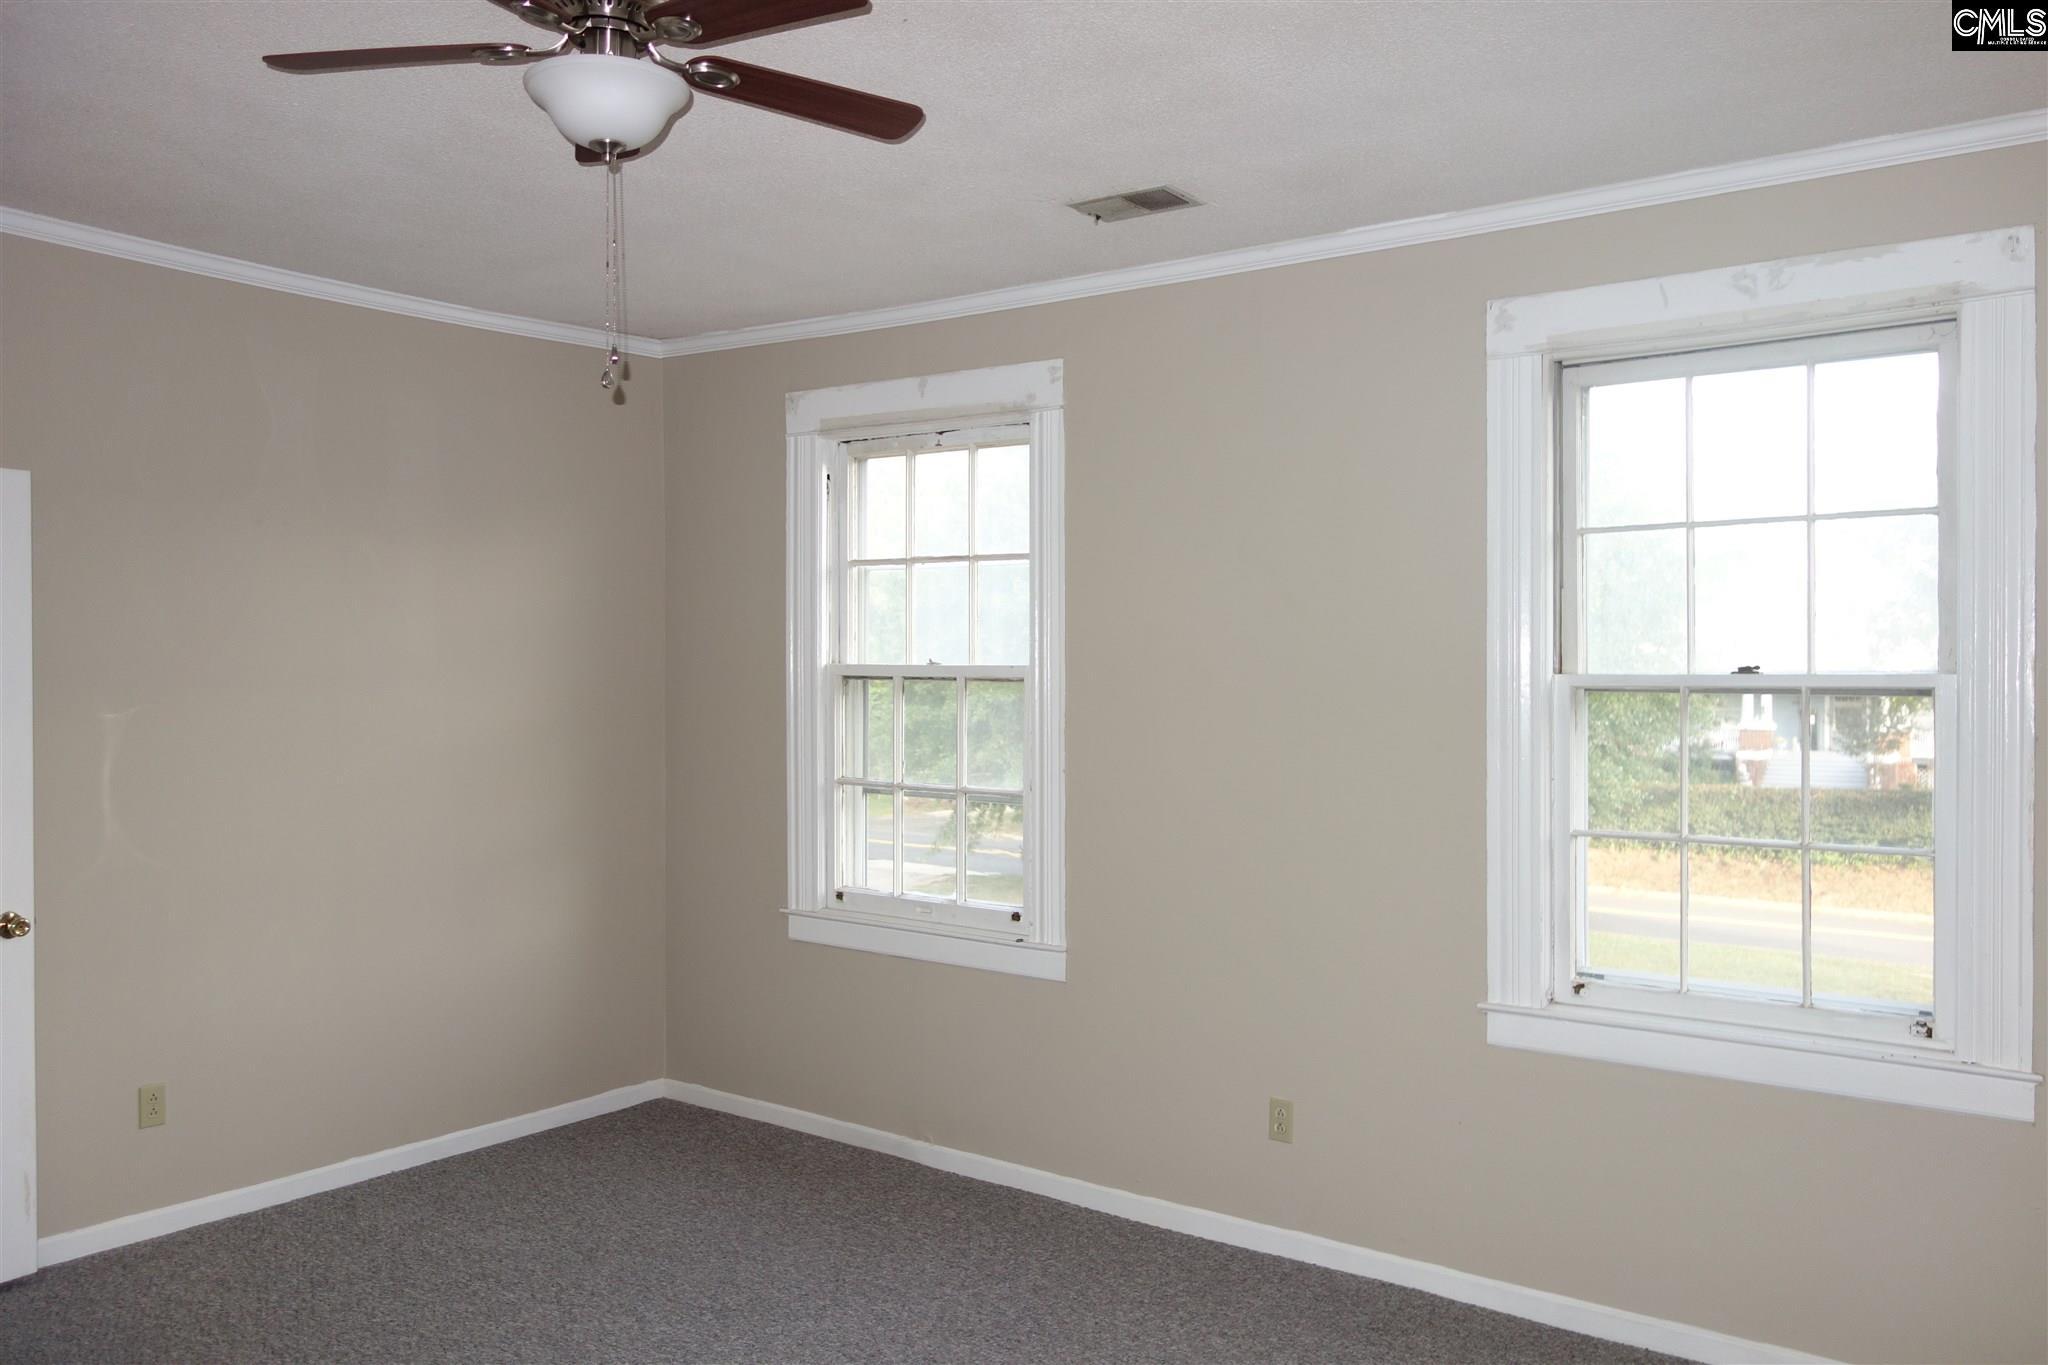 105 W High #4 Winnsboro, SC 29180